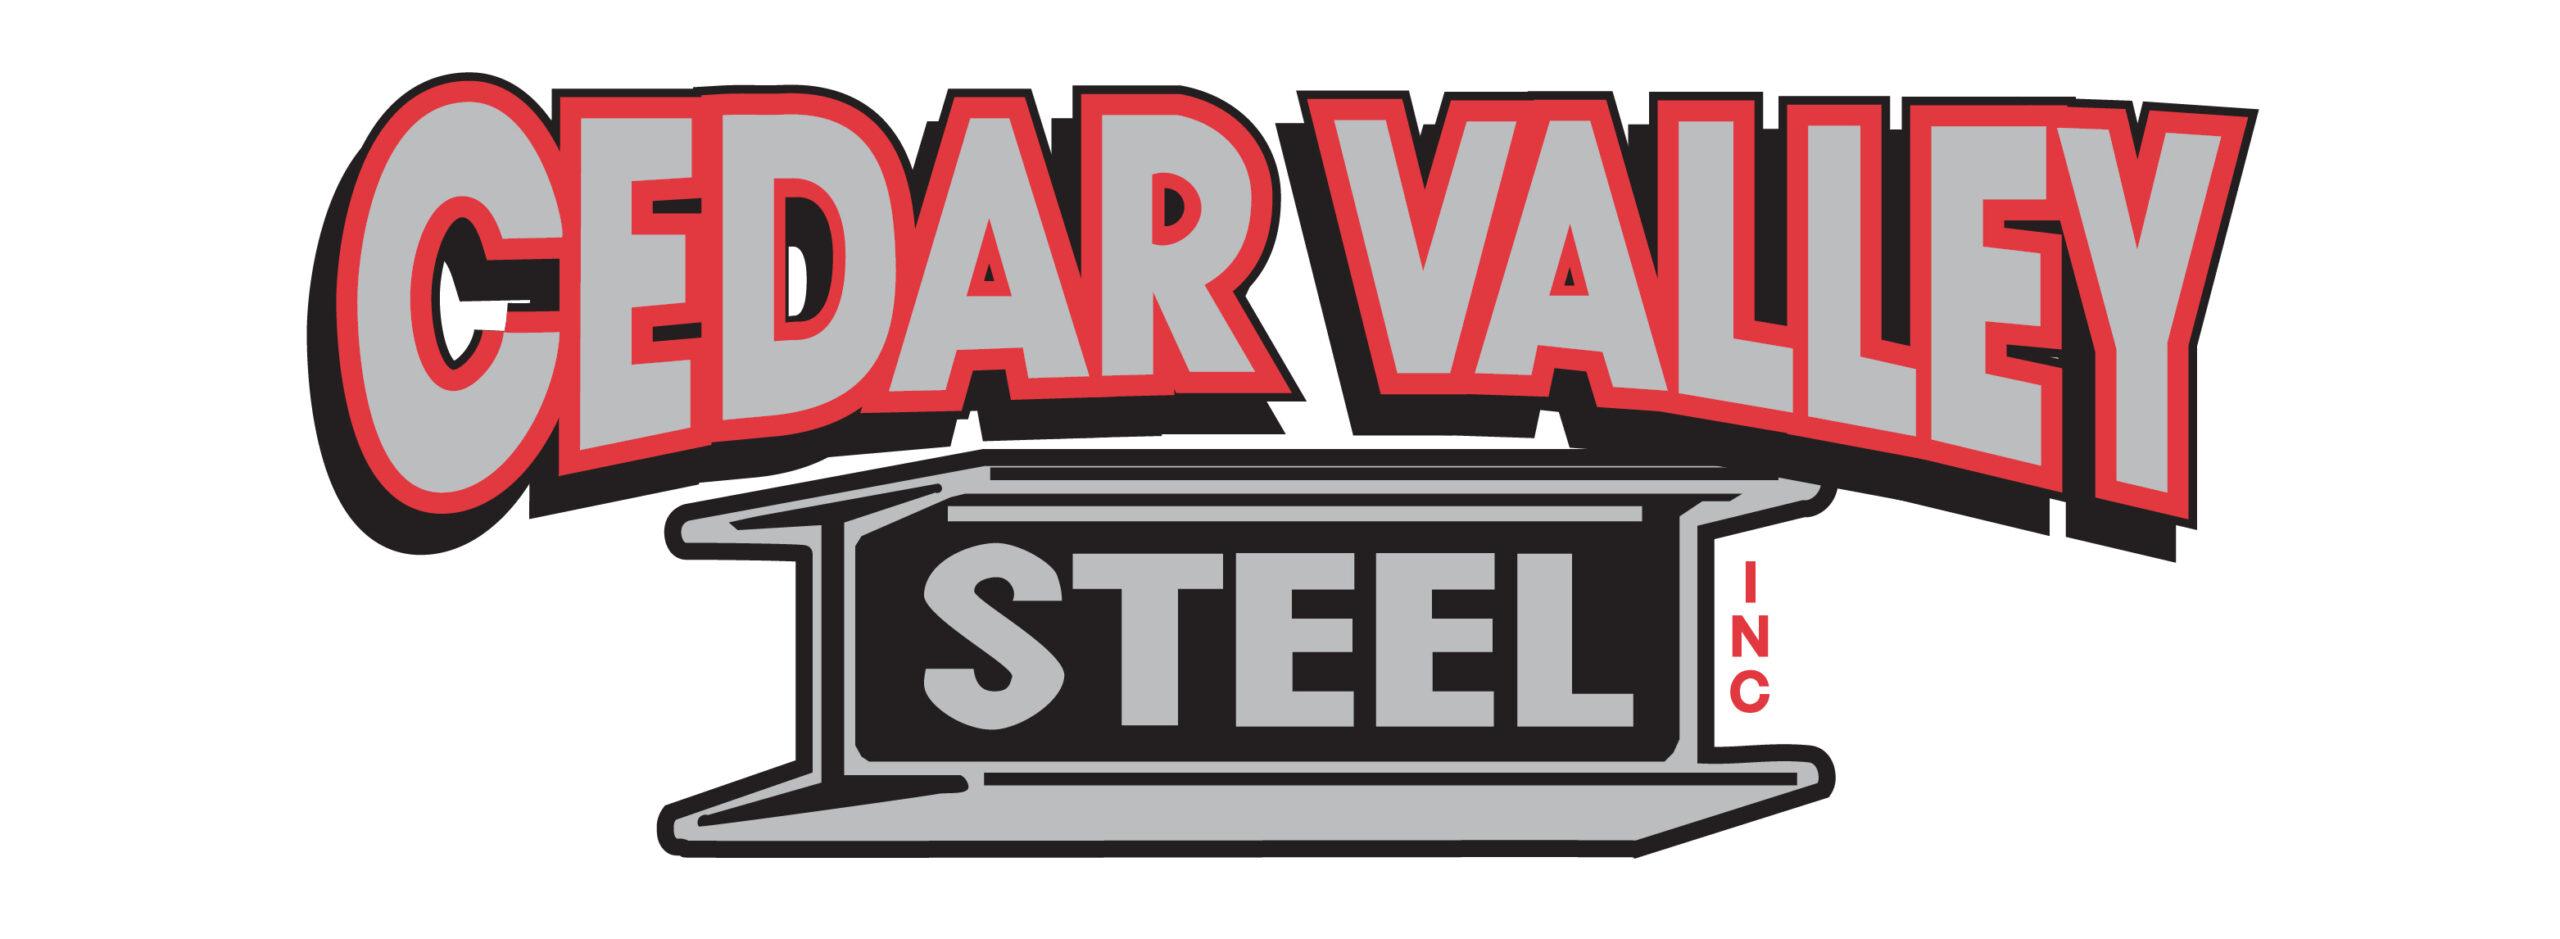 Cedar Valley Steel